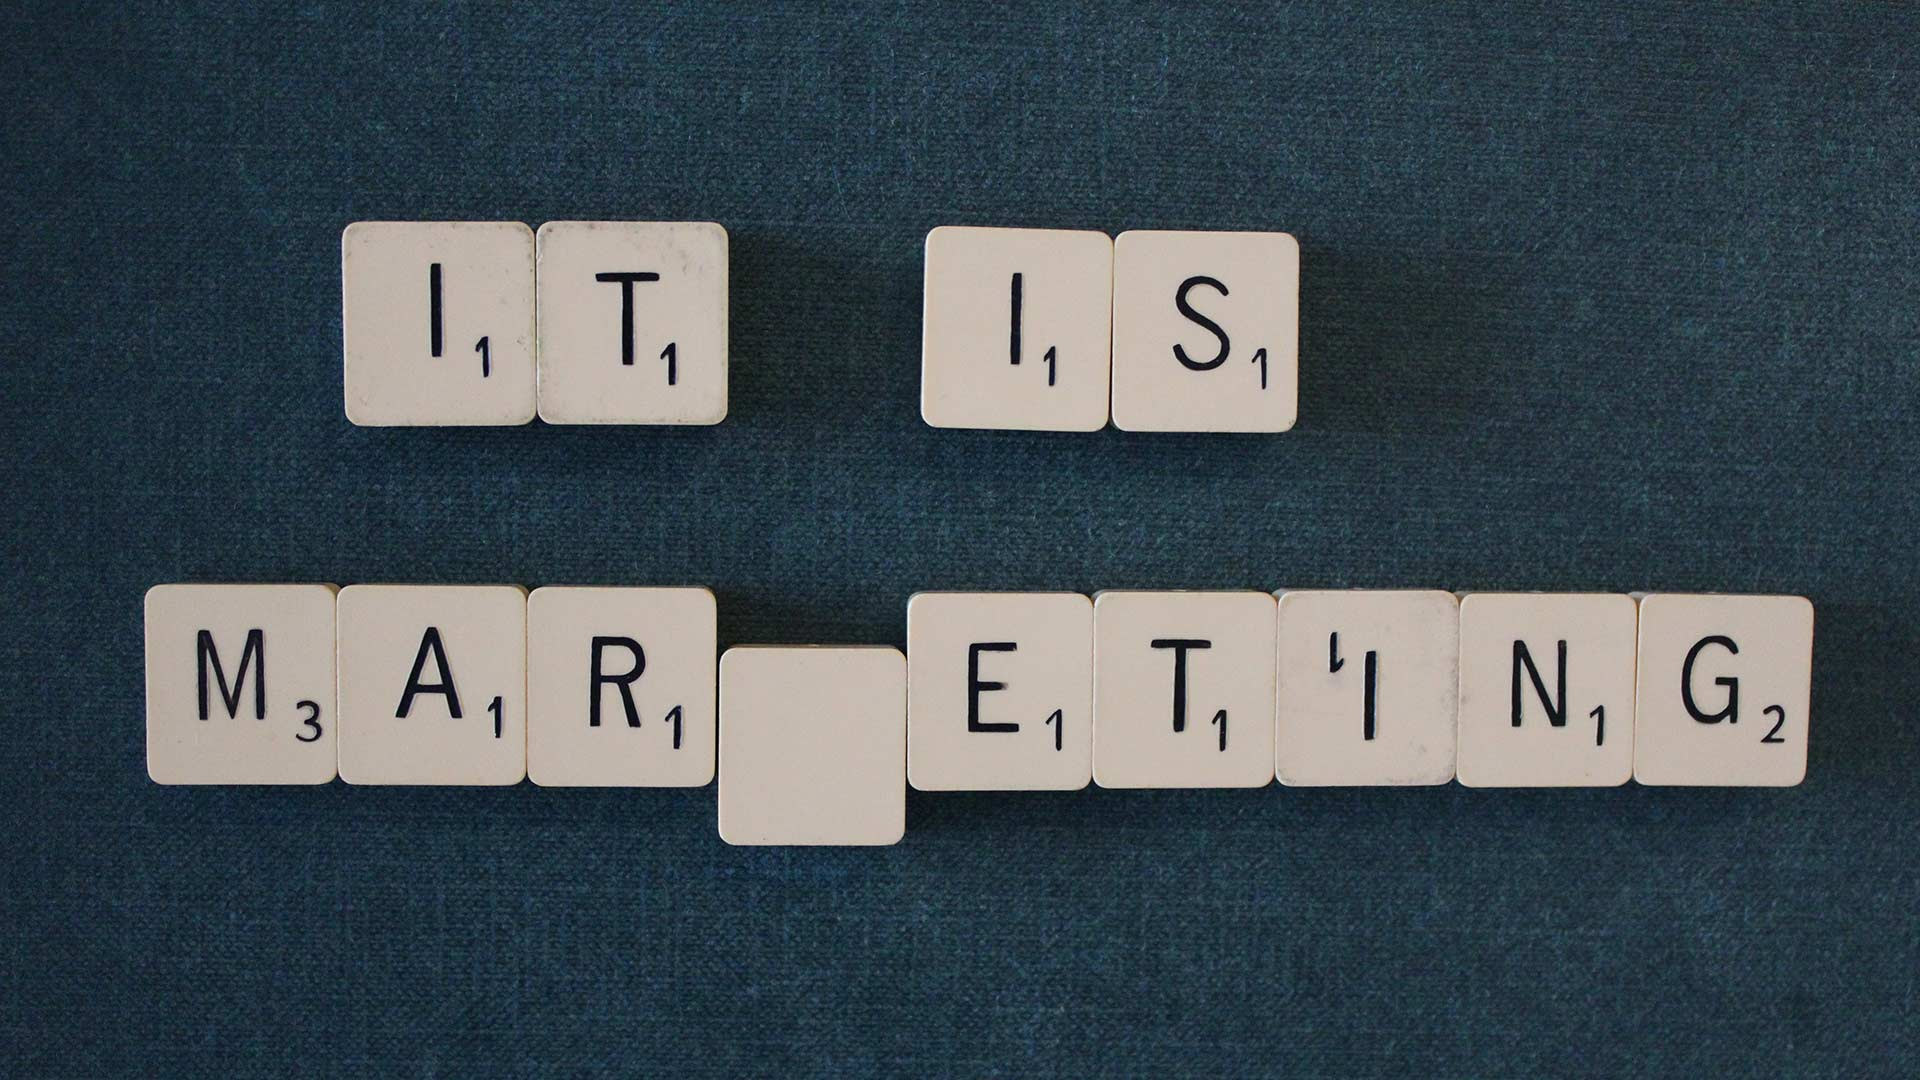 number-brand-font-text-marketing-screenshot-681264-pxhere.com